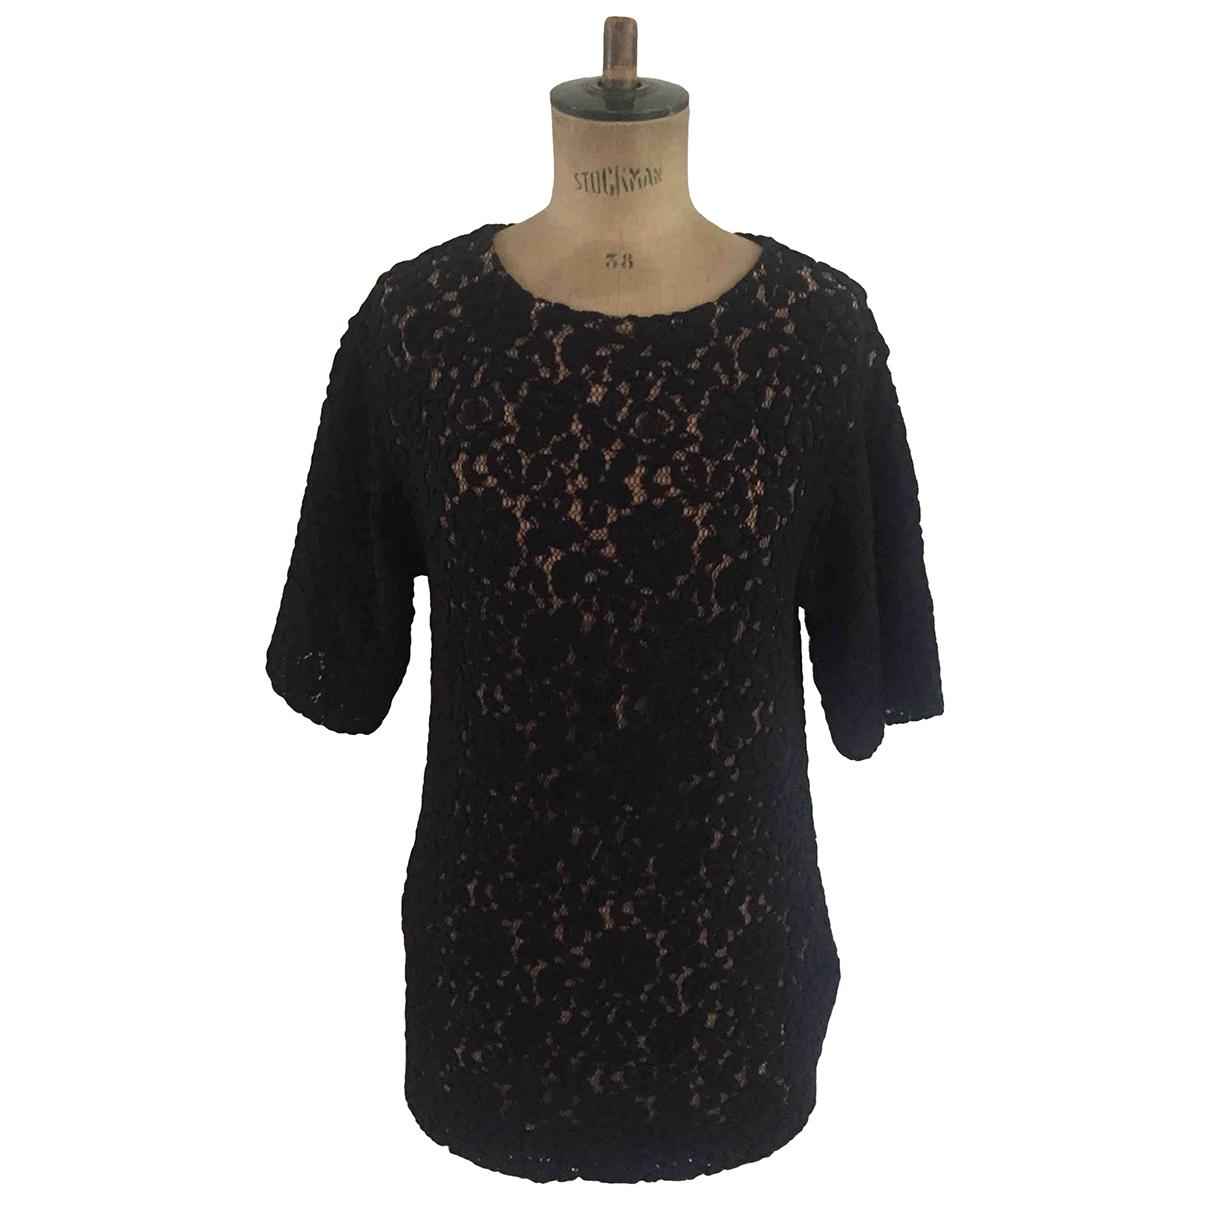 Chloé N Black Cotton dress for Women 34 FR